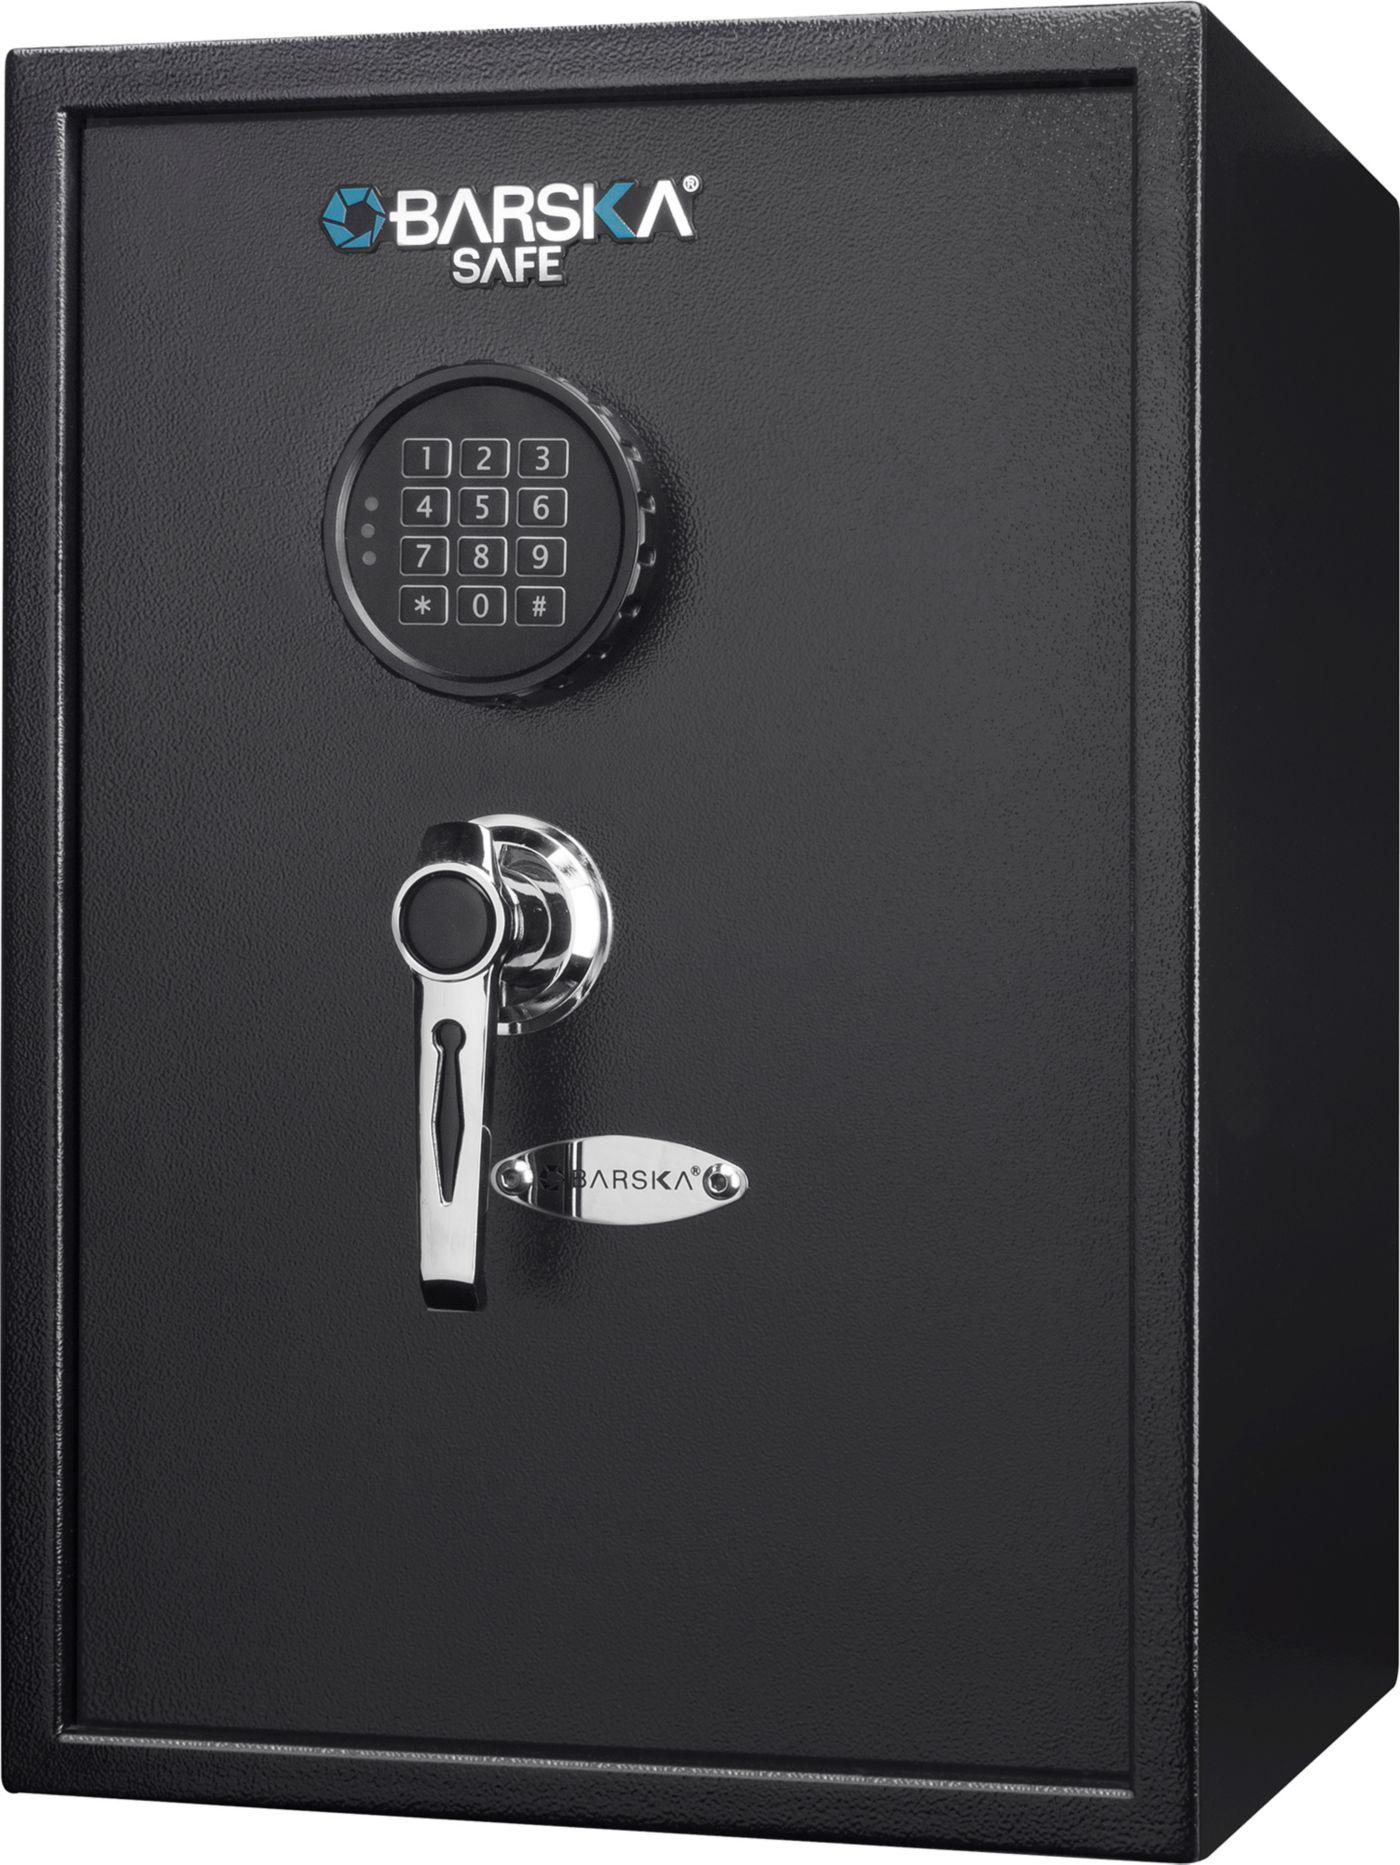 Barska Large Safe with Keypad Lock